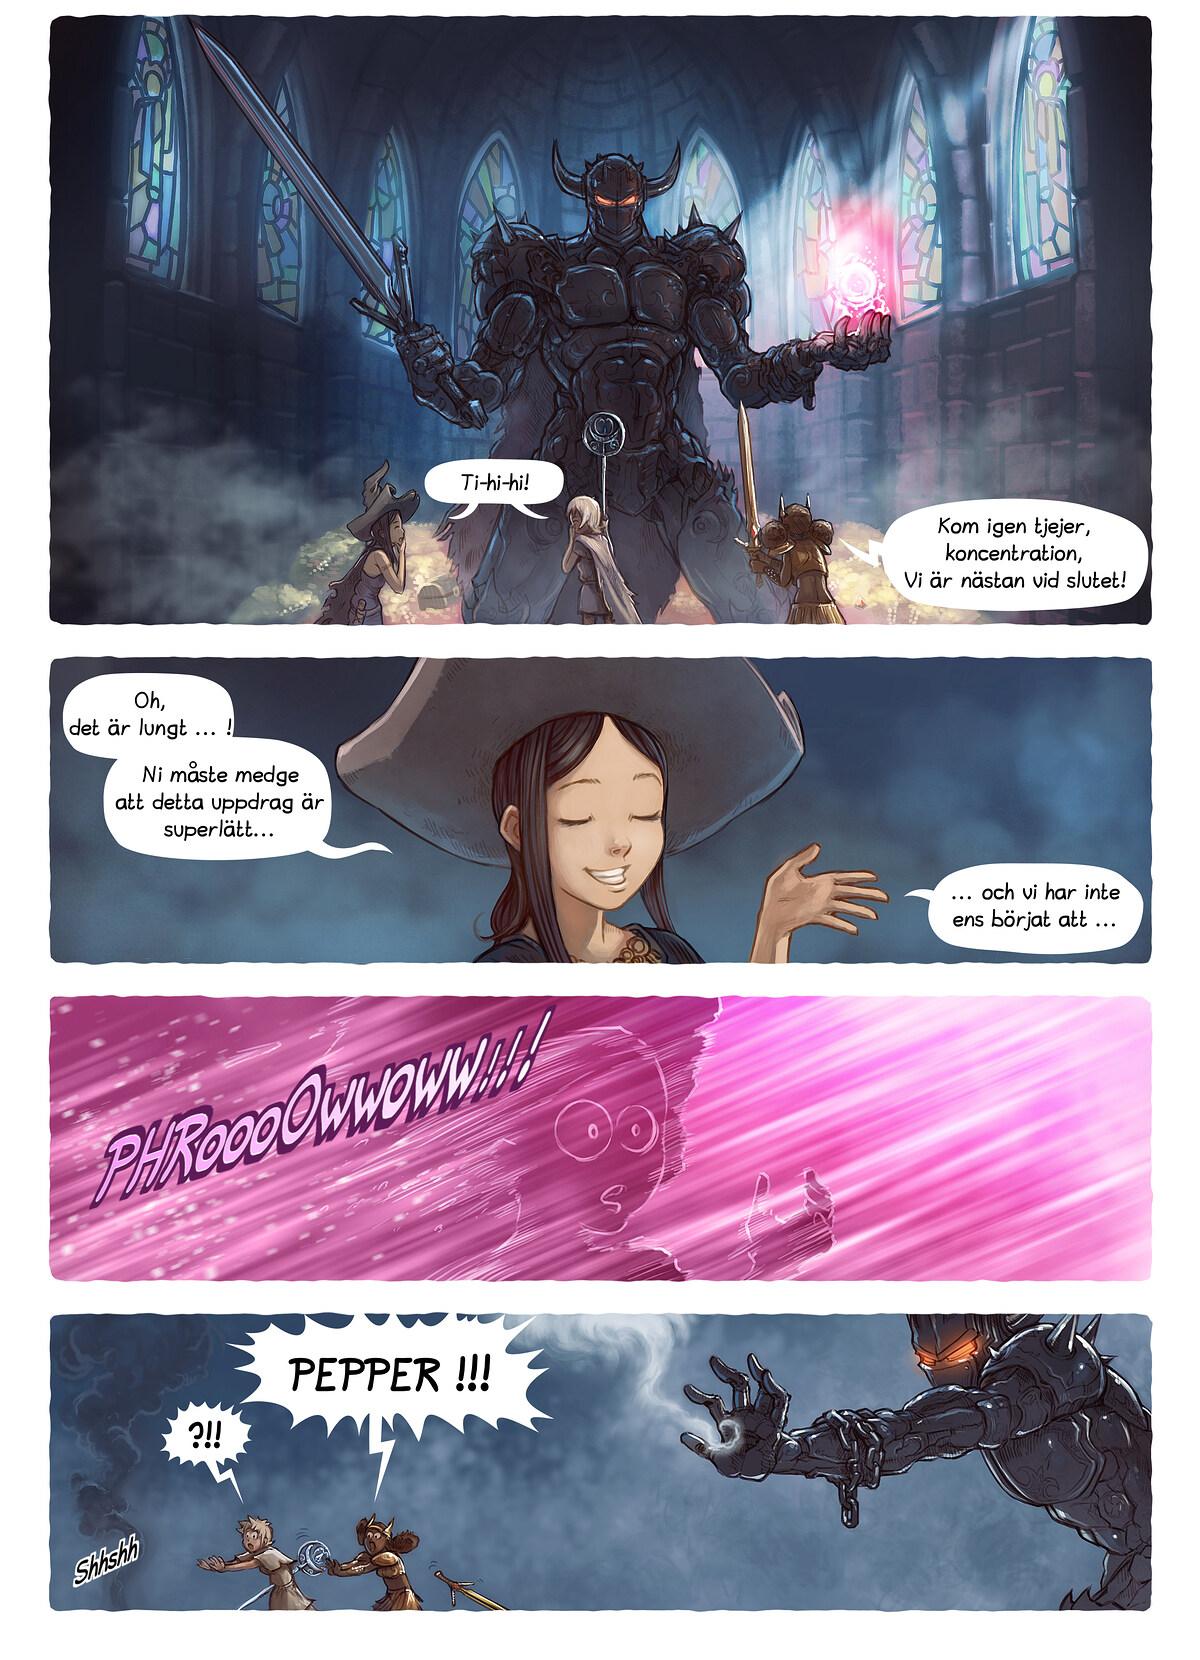 Episode 13: Pyjamasparty, Page 4